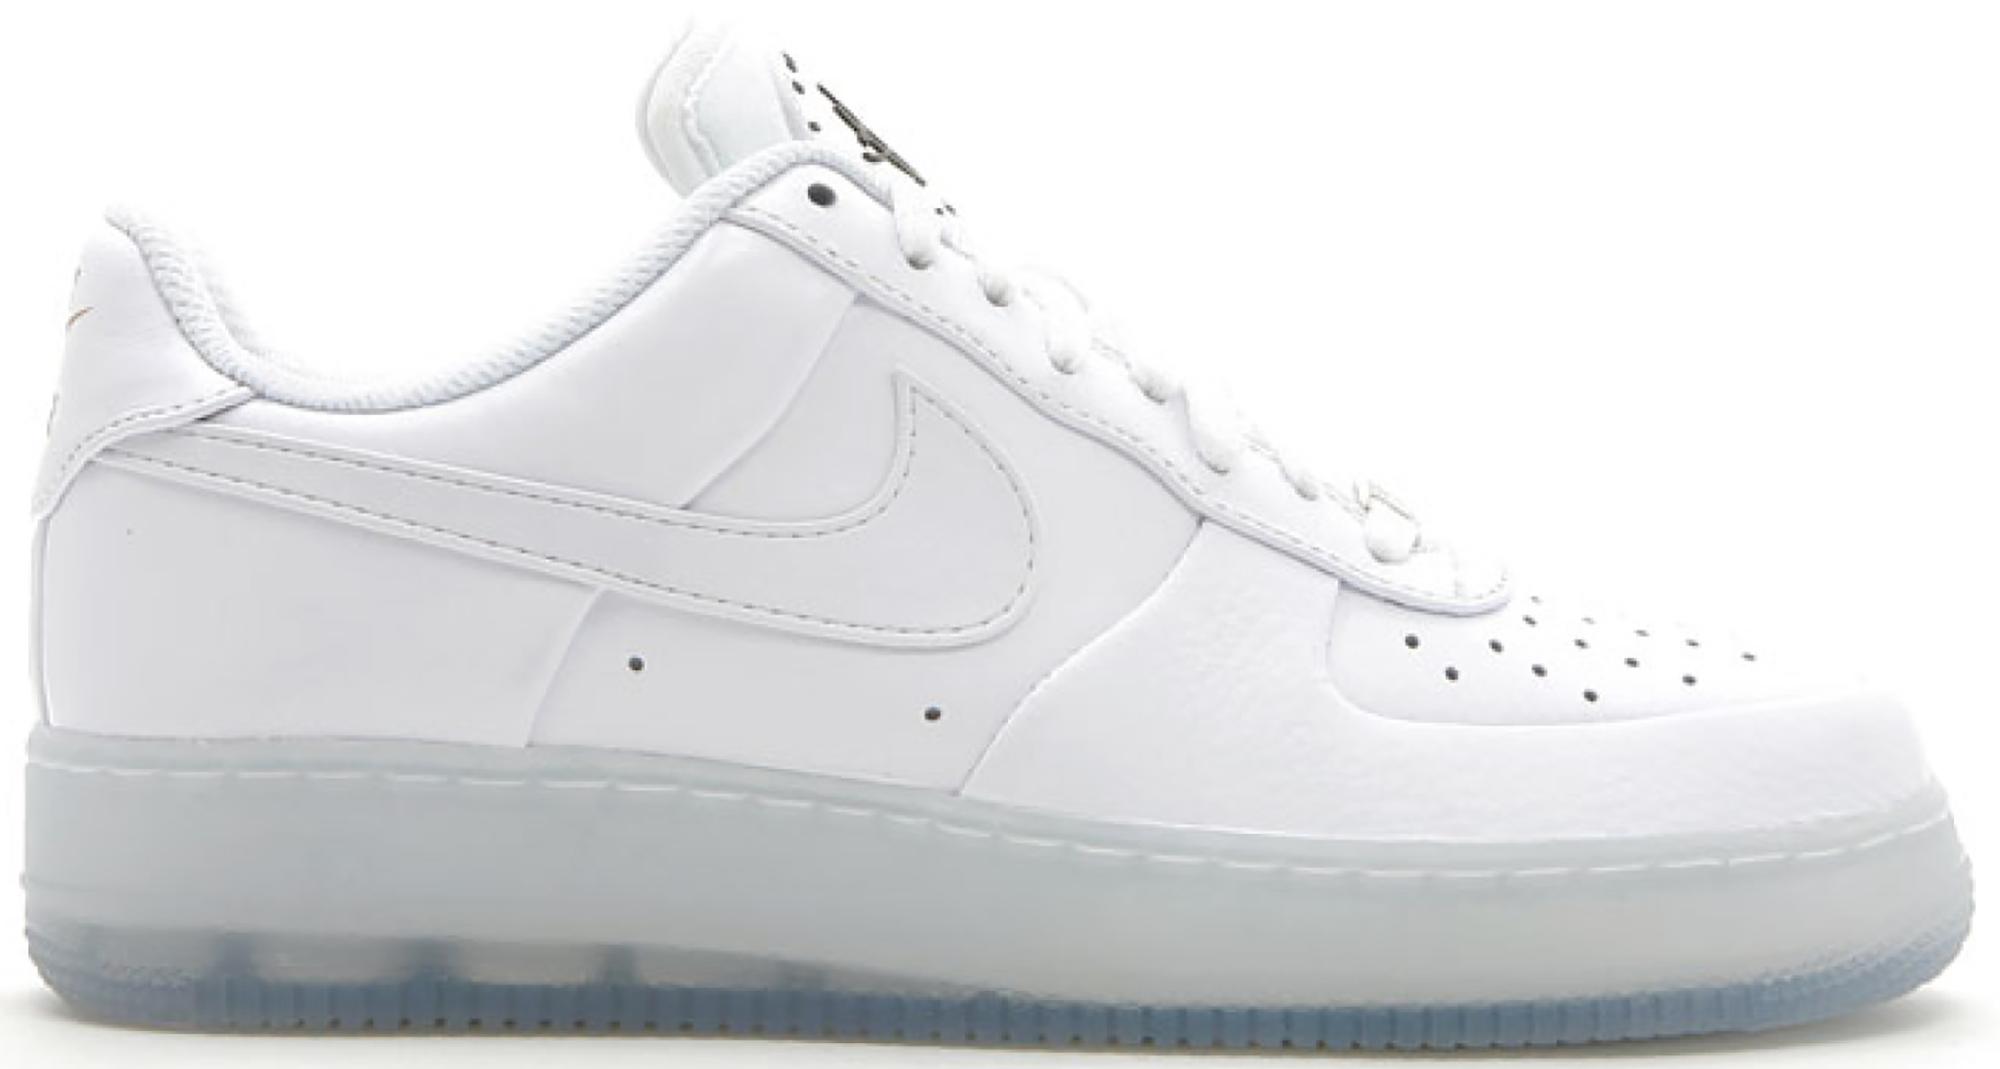 Nike Air Force 1 Low Supreme Huarache